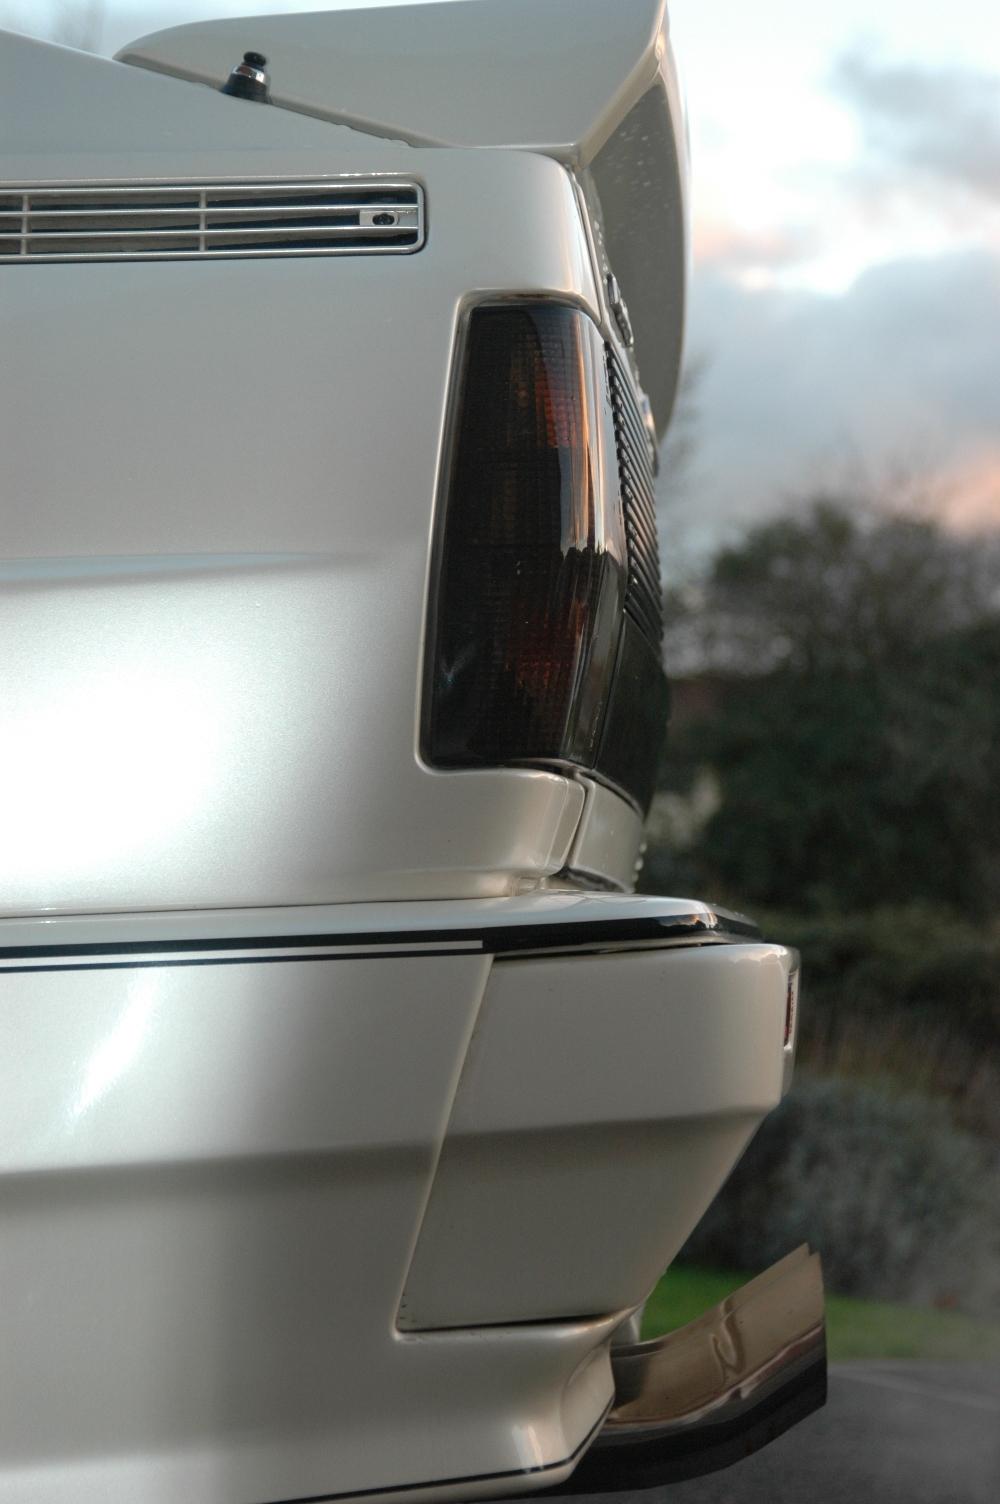 phumy's car